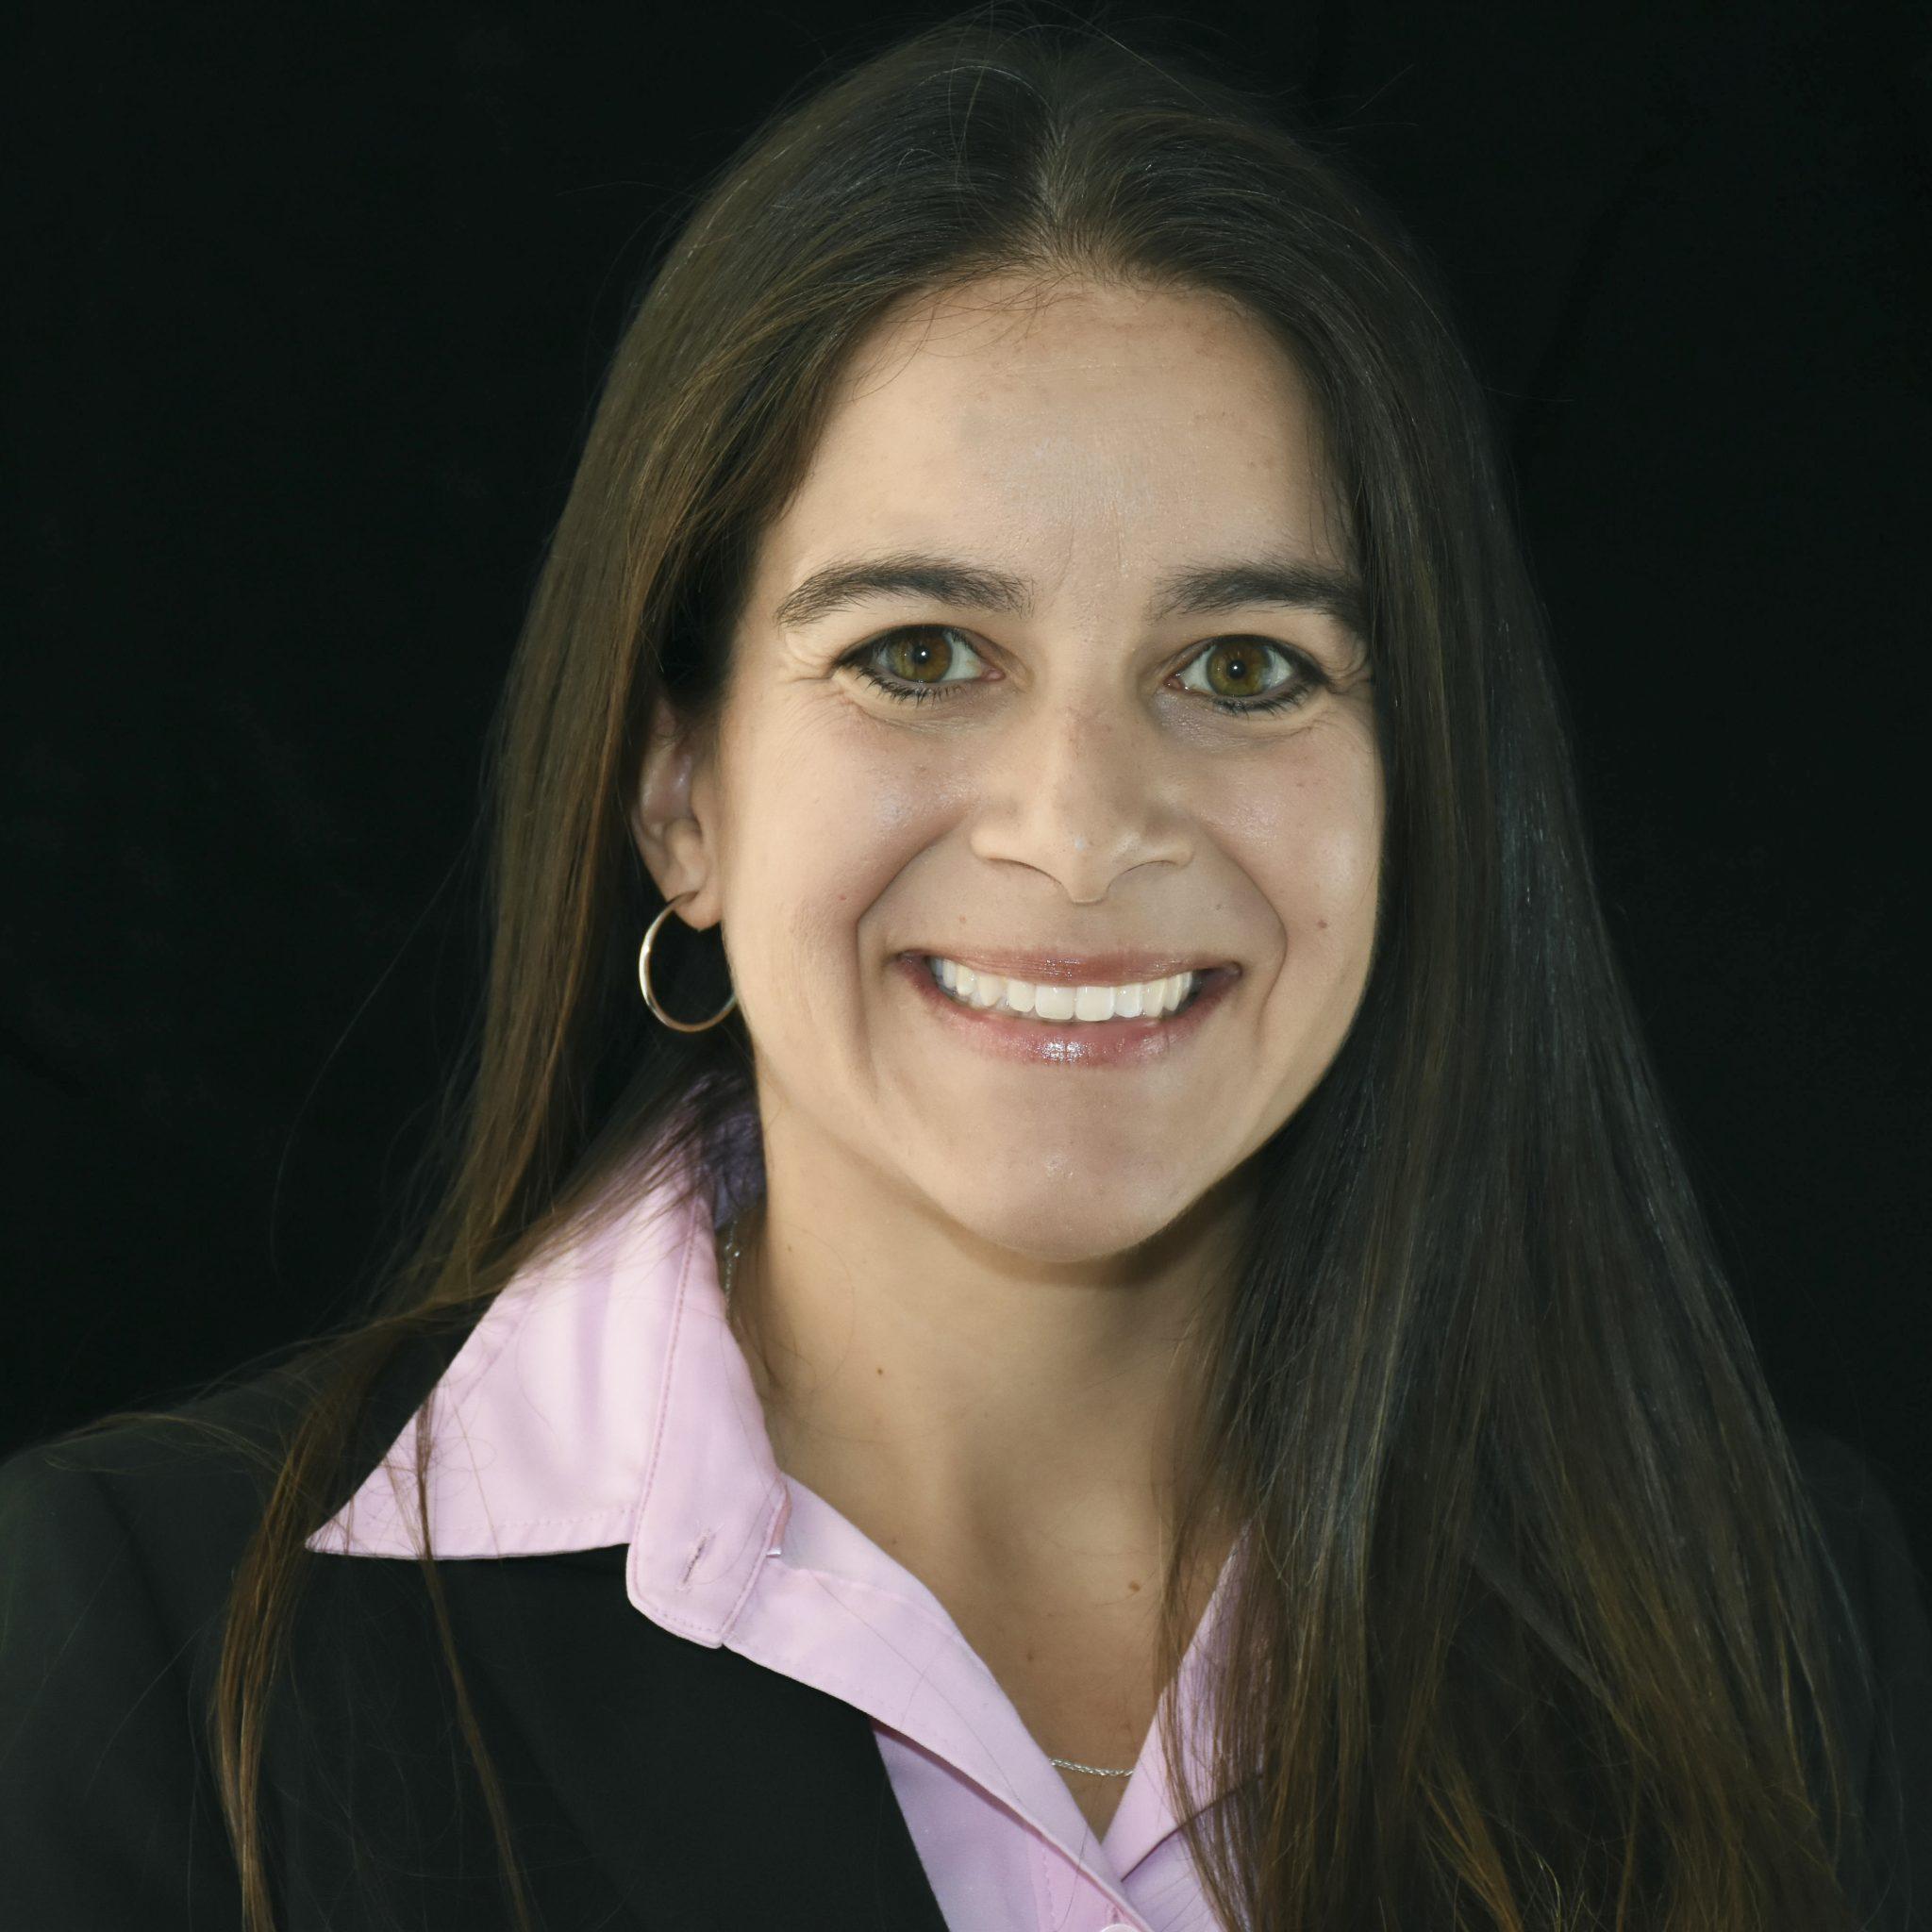 Jennifer Delmas